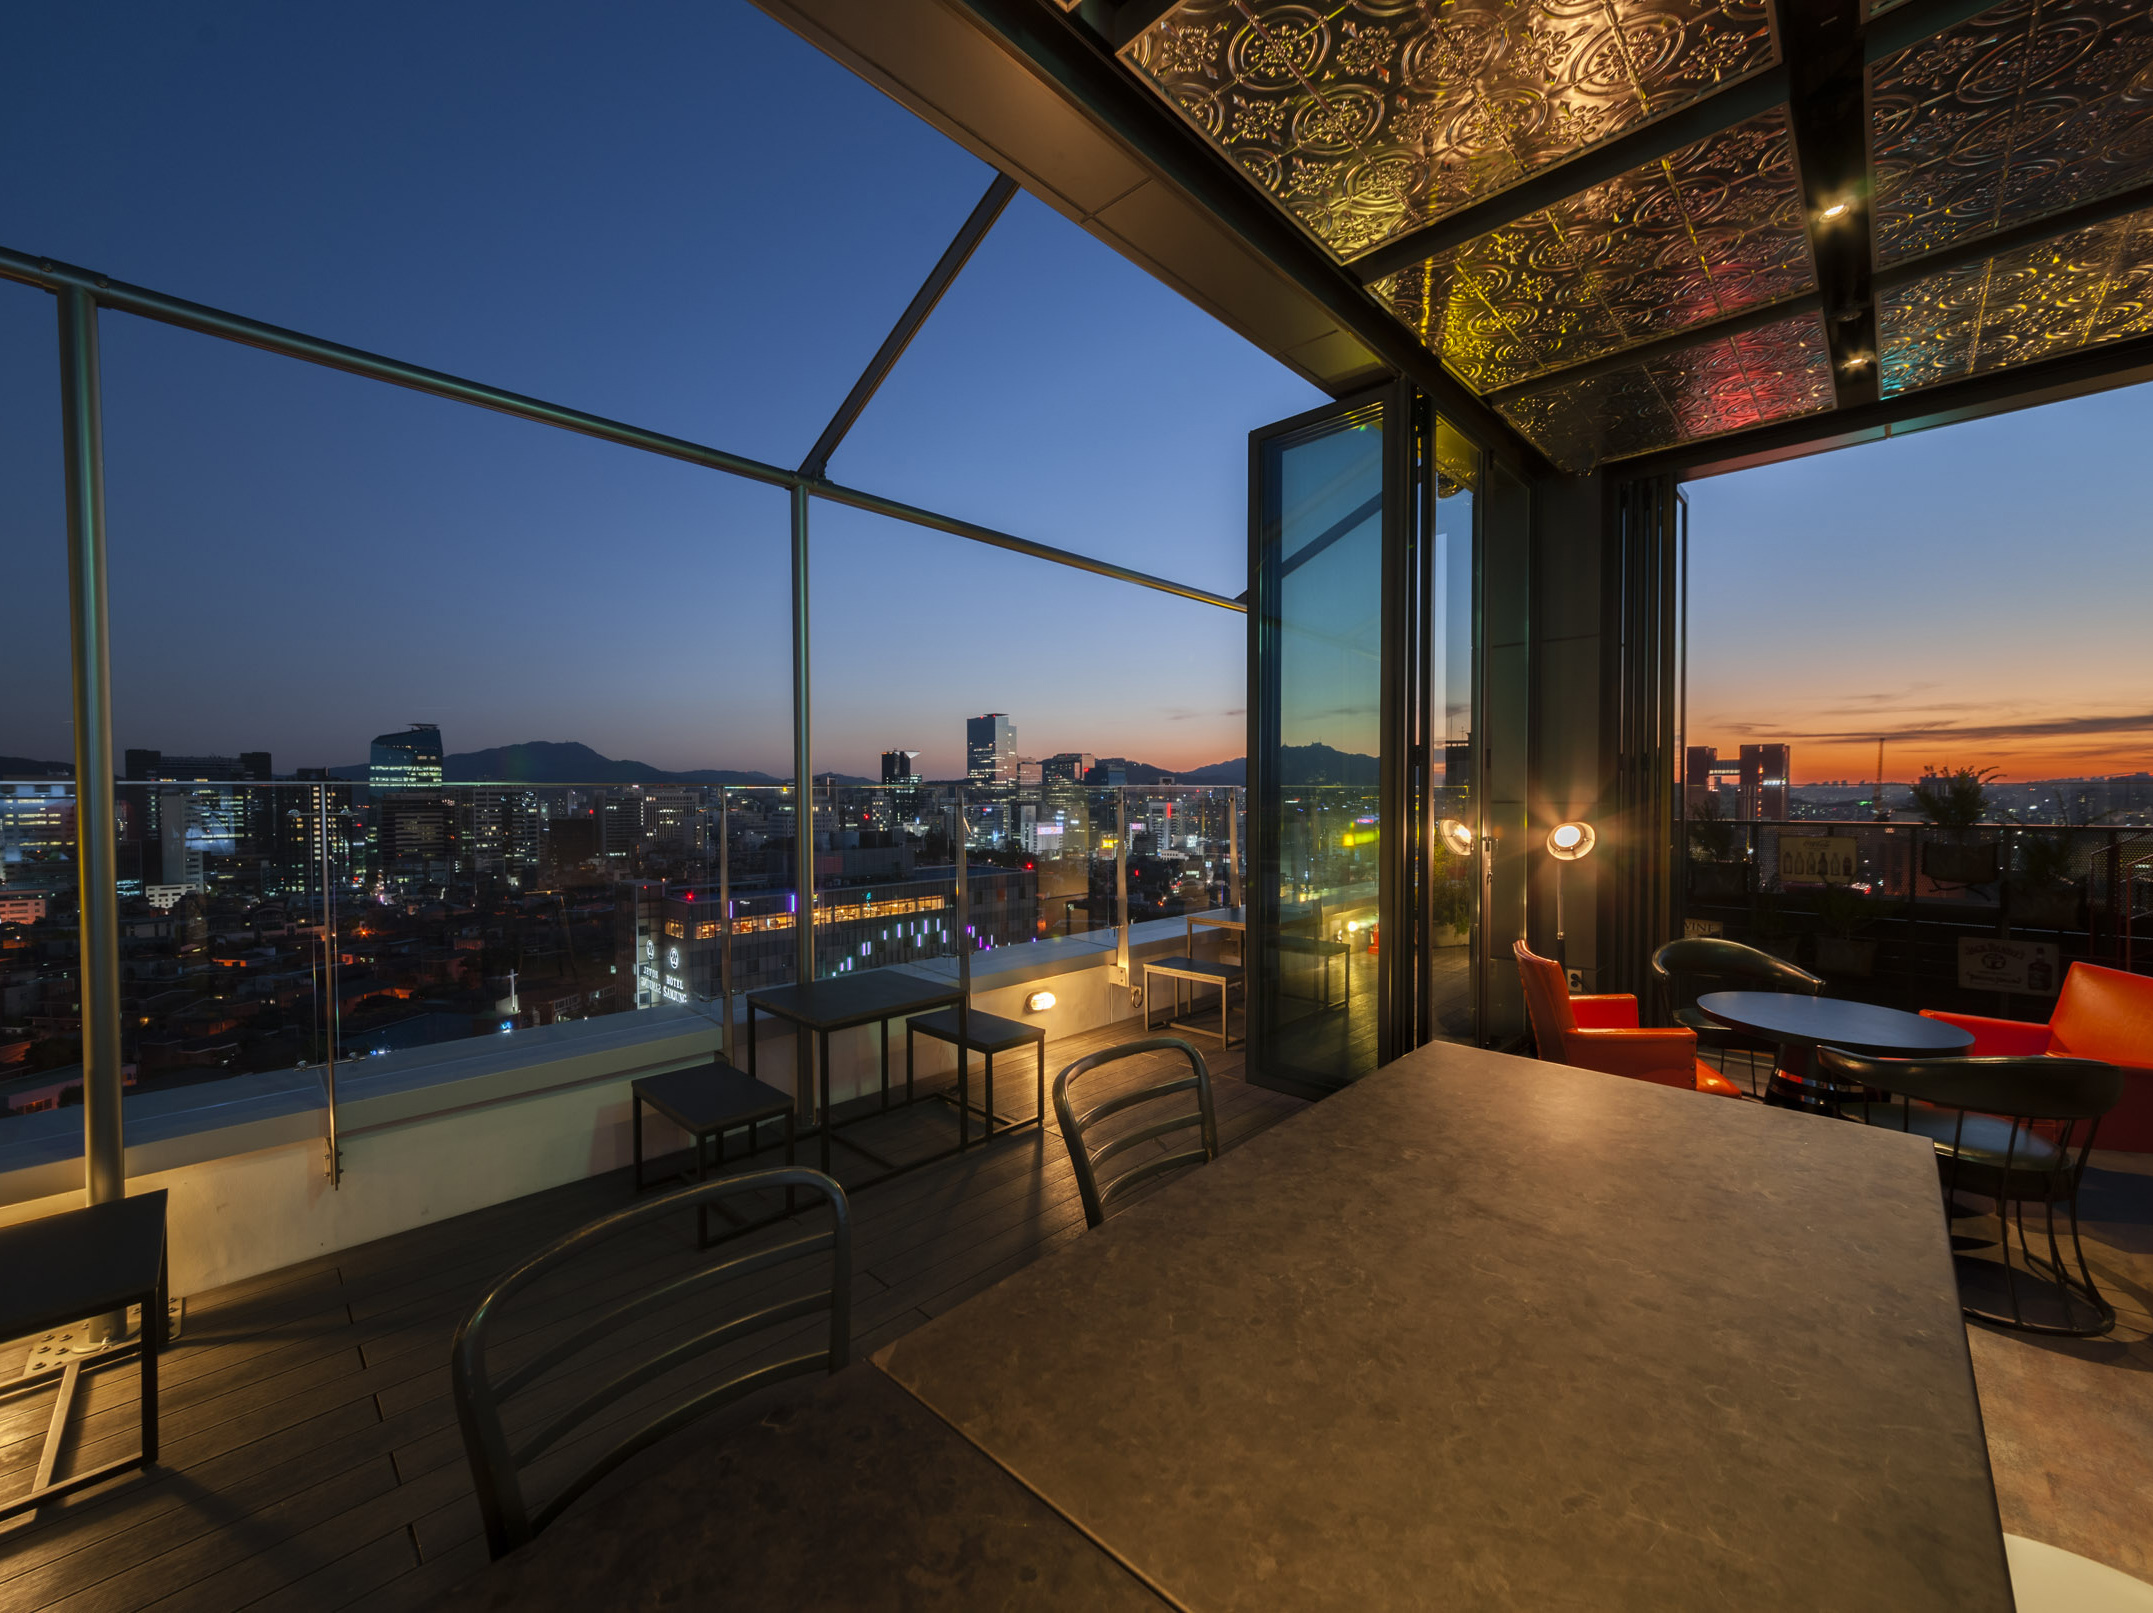 rooftop bar hotel seoul cappuccino bars